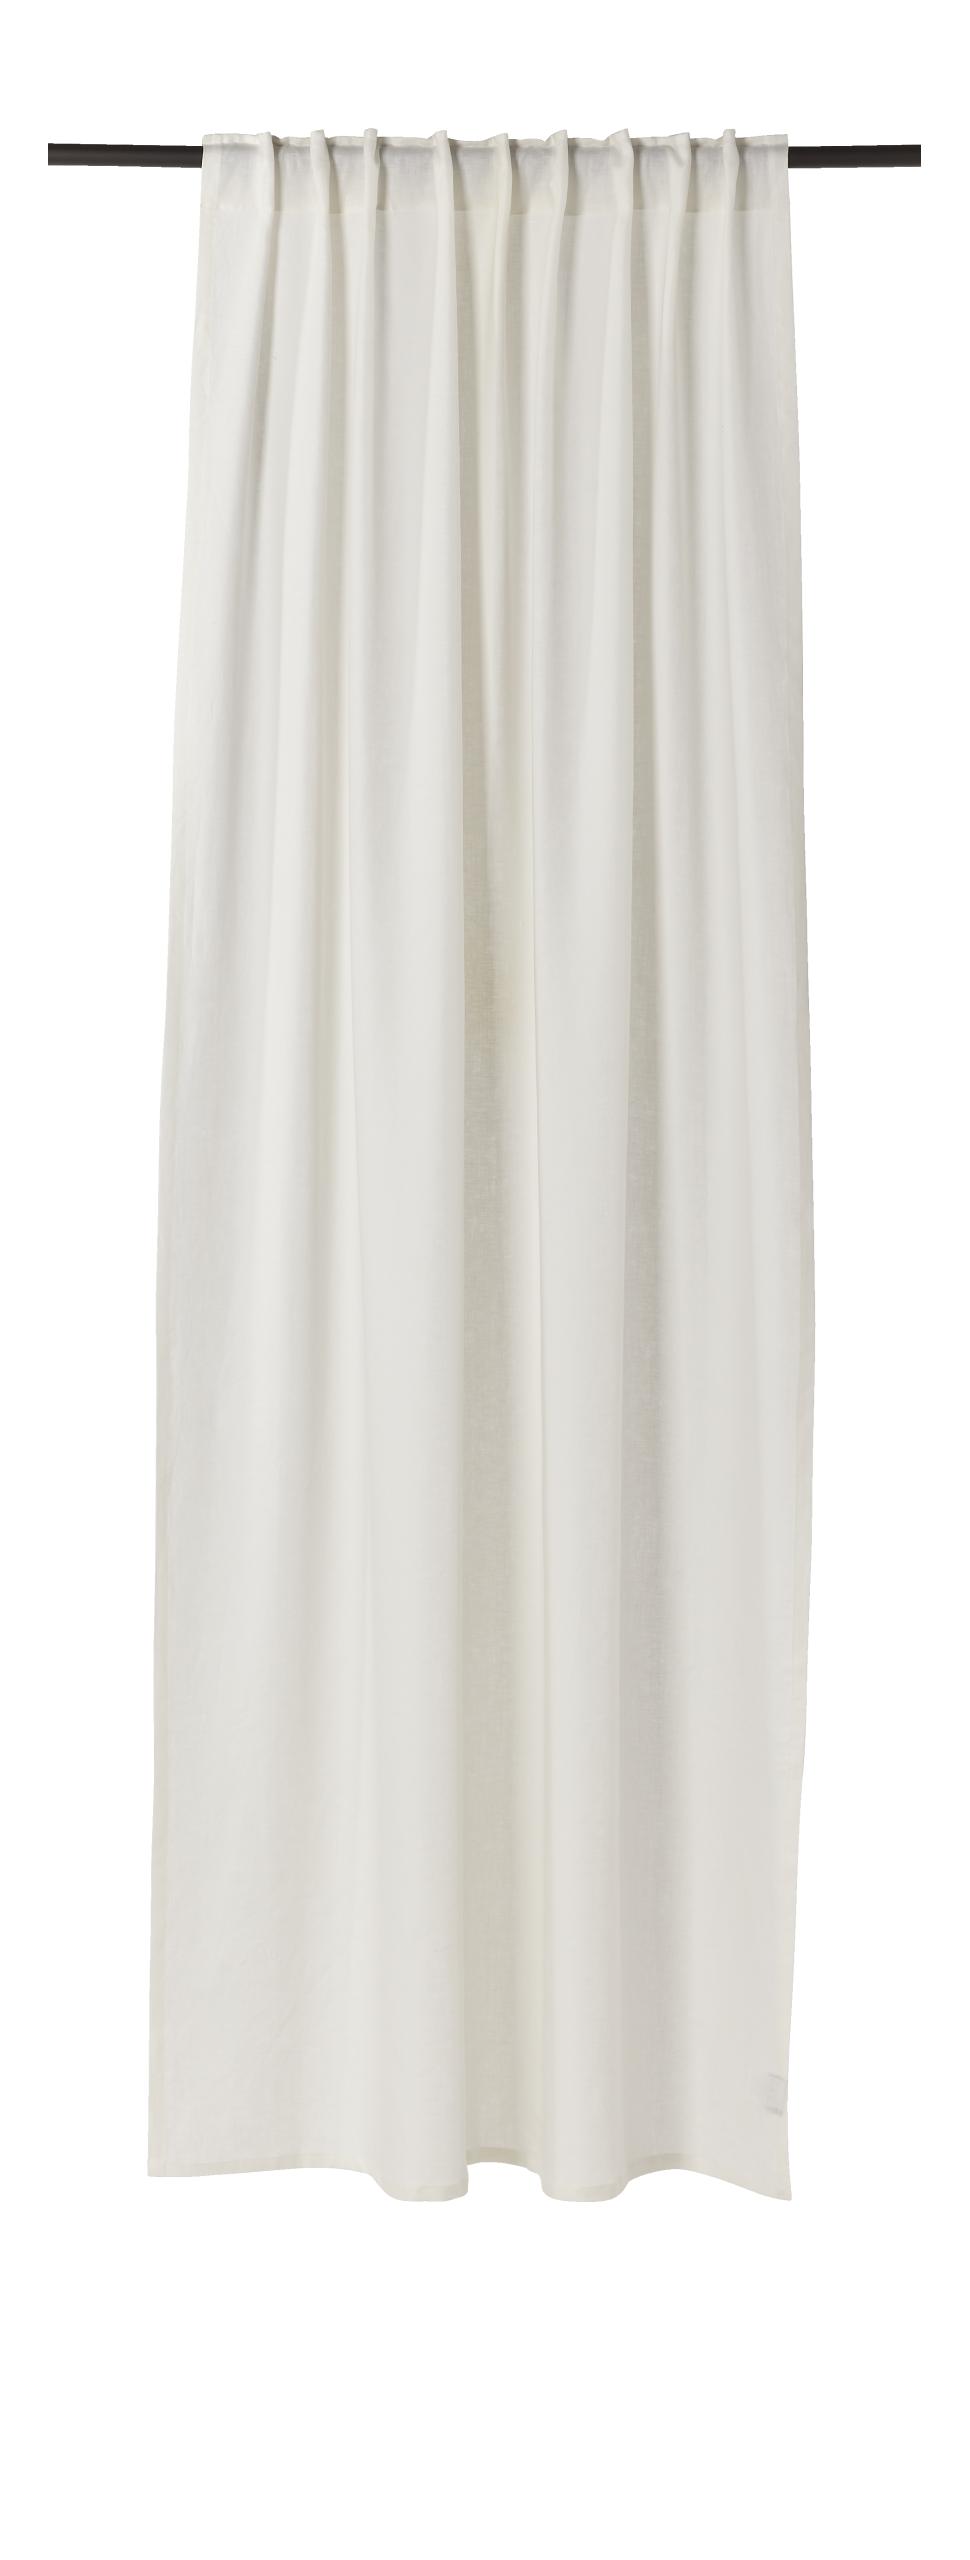 albany rideaux blanc tissu lin habitat les rideaux decodeuse pinterest rideau blanc. Black Bedroom Furniture Sets. Home Design Ideas